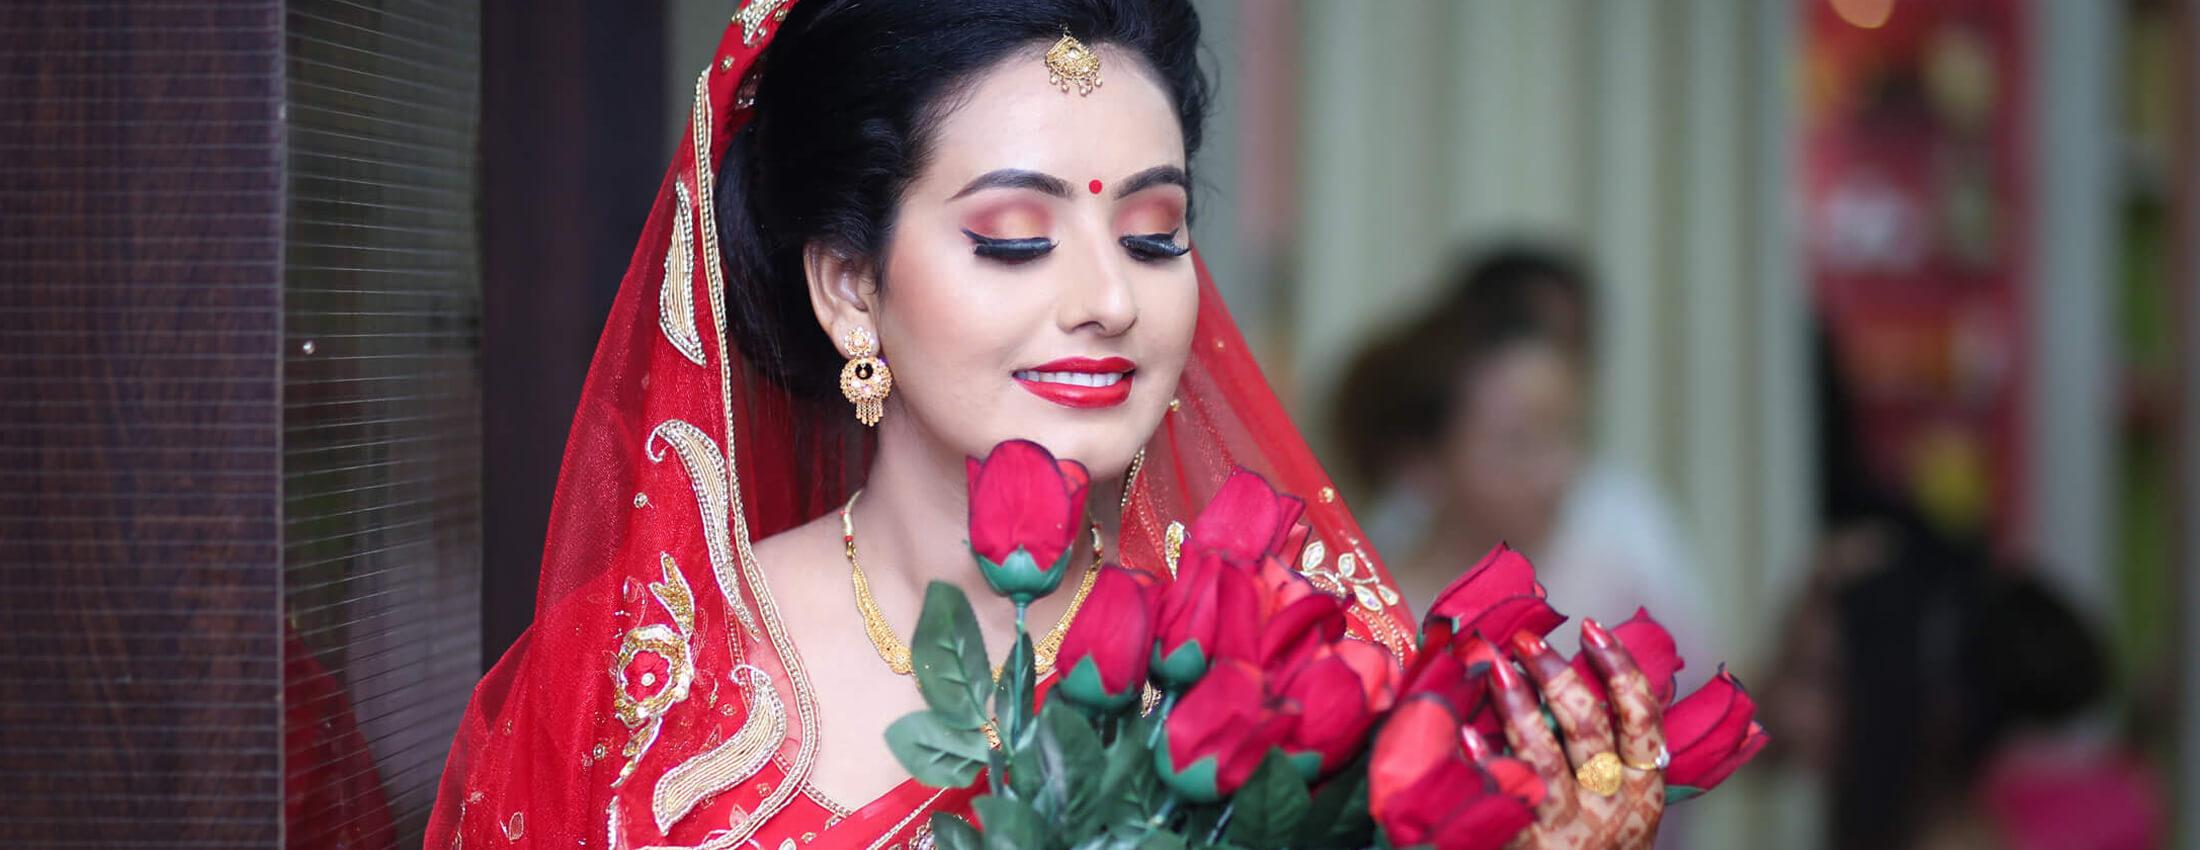 Pragya Bridal Photoshoot - Imgstock, Biratnagar